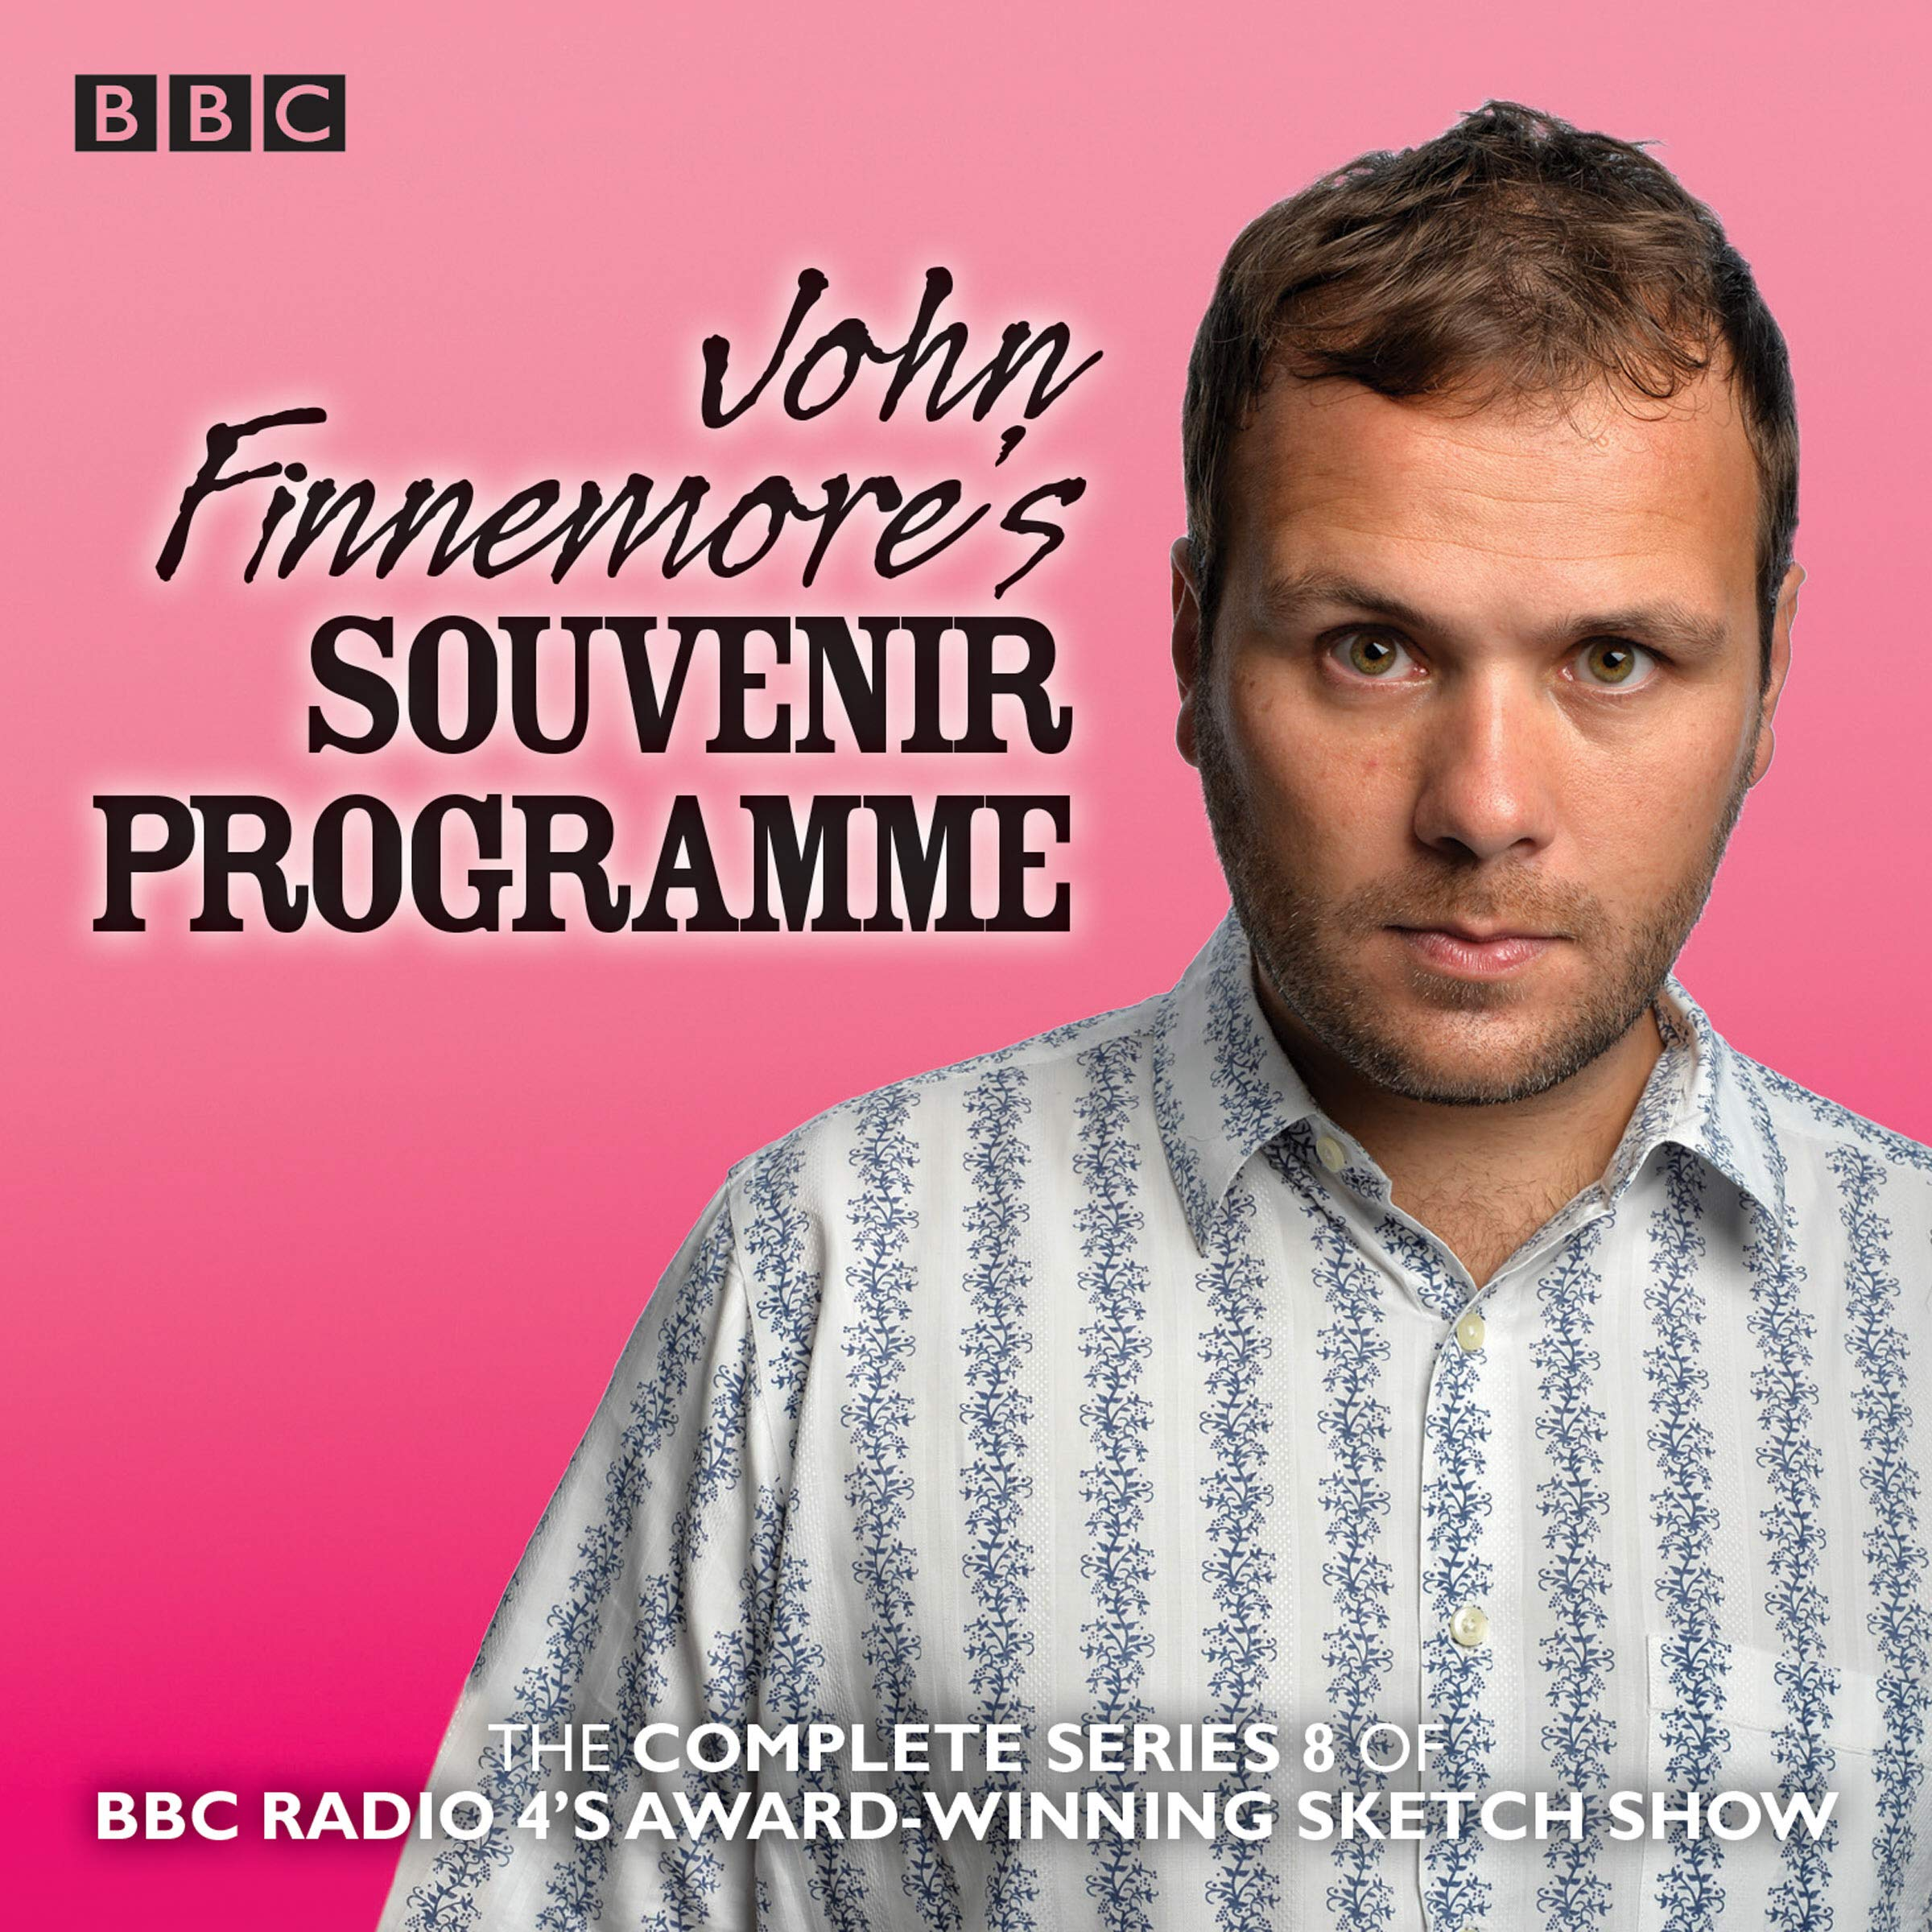 John Finnemore's Souvenir Programme  Series 8  The BBC Radio 4 Comedy Sketch Show